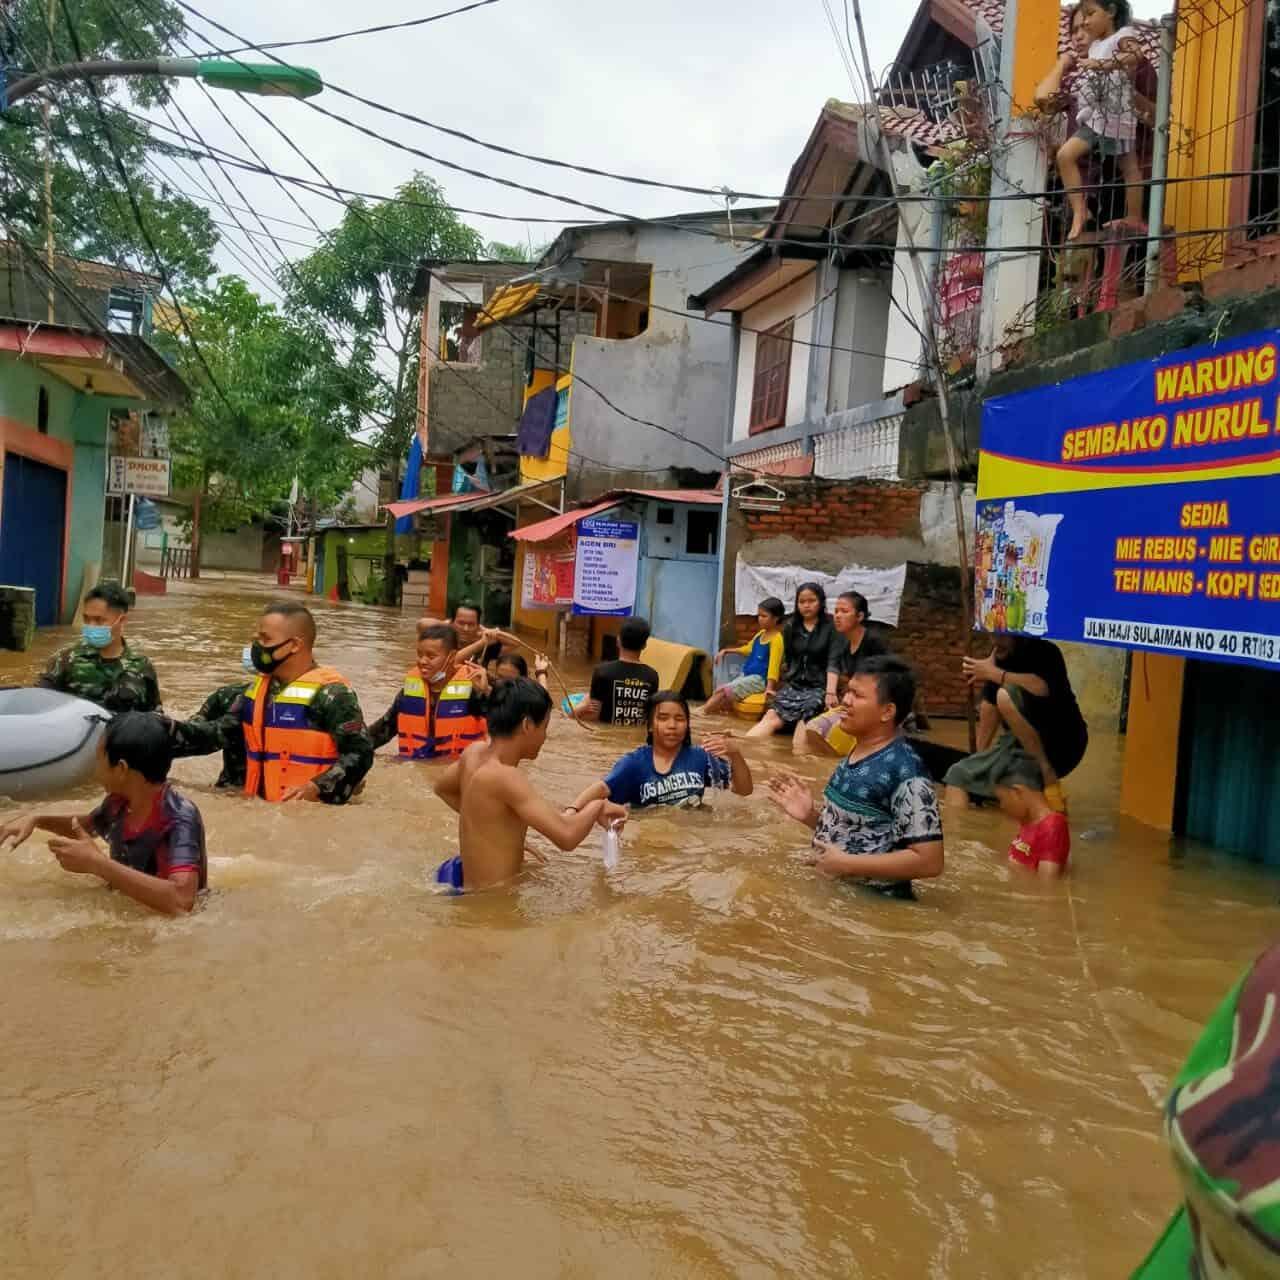 Koopsau I, Lanud Halim dan Wing 1 Paskhas, Evakuasi Warga Cipinang Melayu